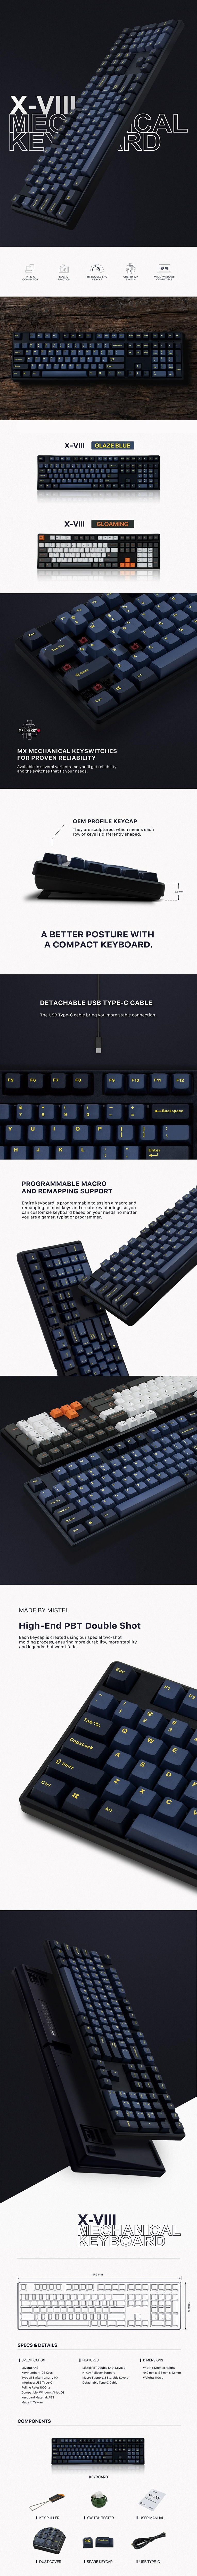 Mistel X8 Series Glaze Blue Mechanical Keyboard - Overview 1